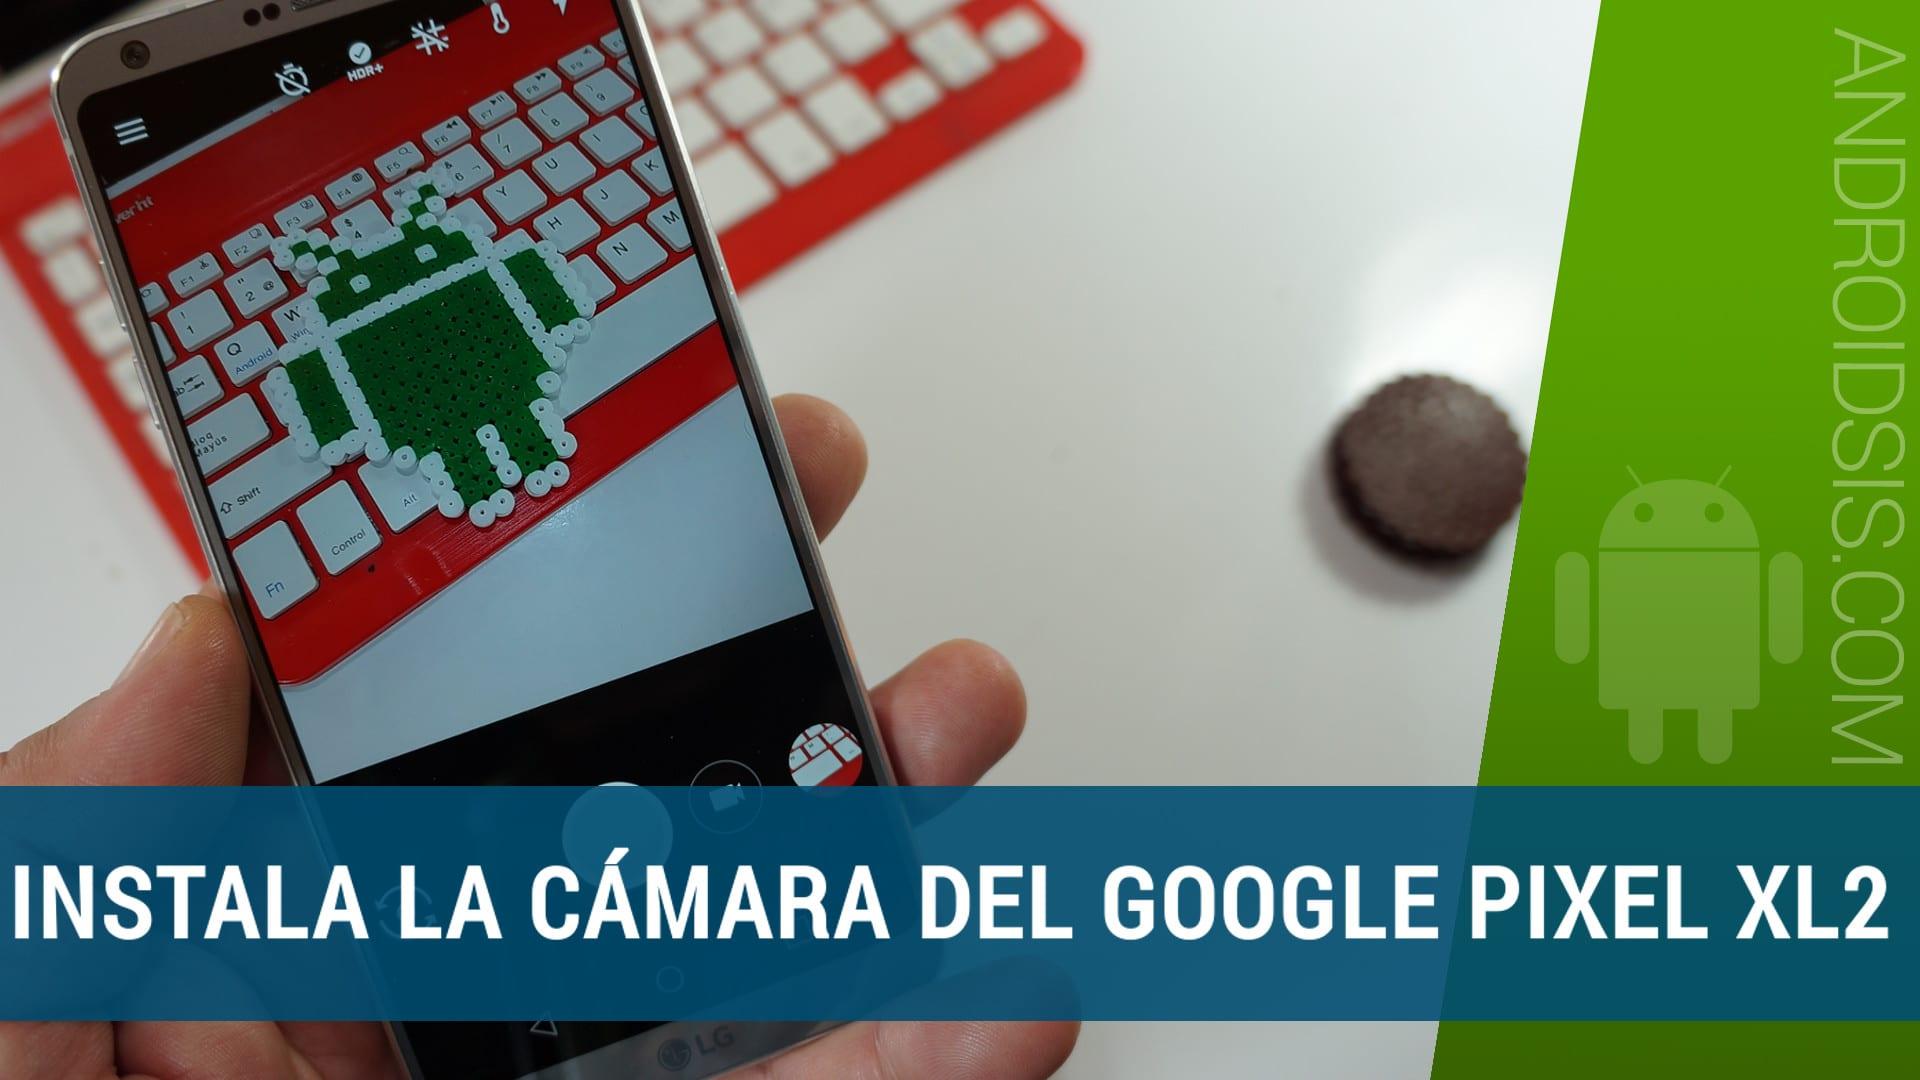 Cámara de los Google Pixel XL2